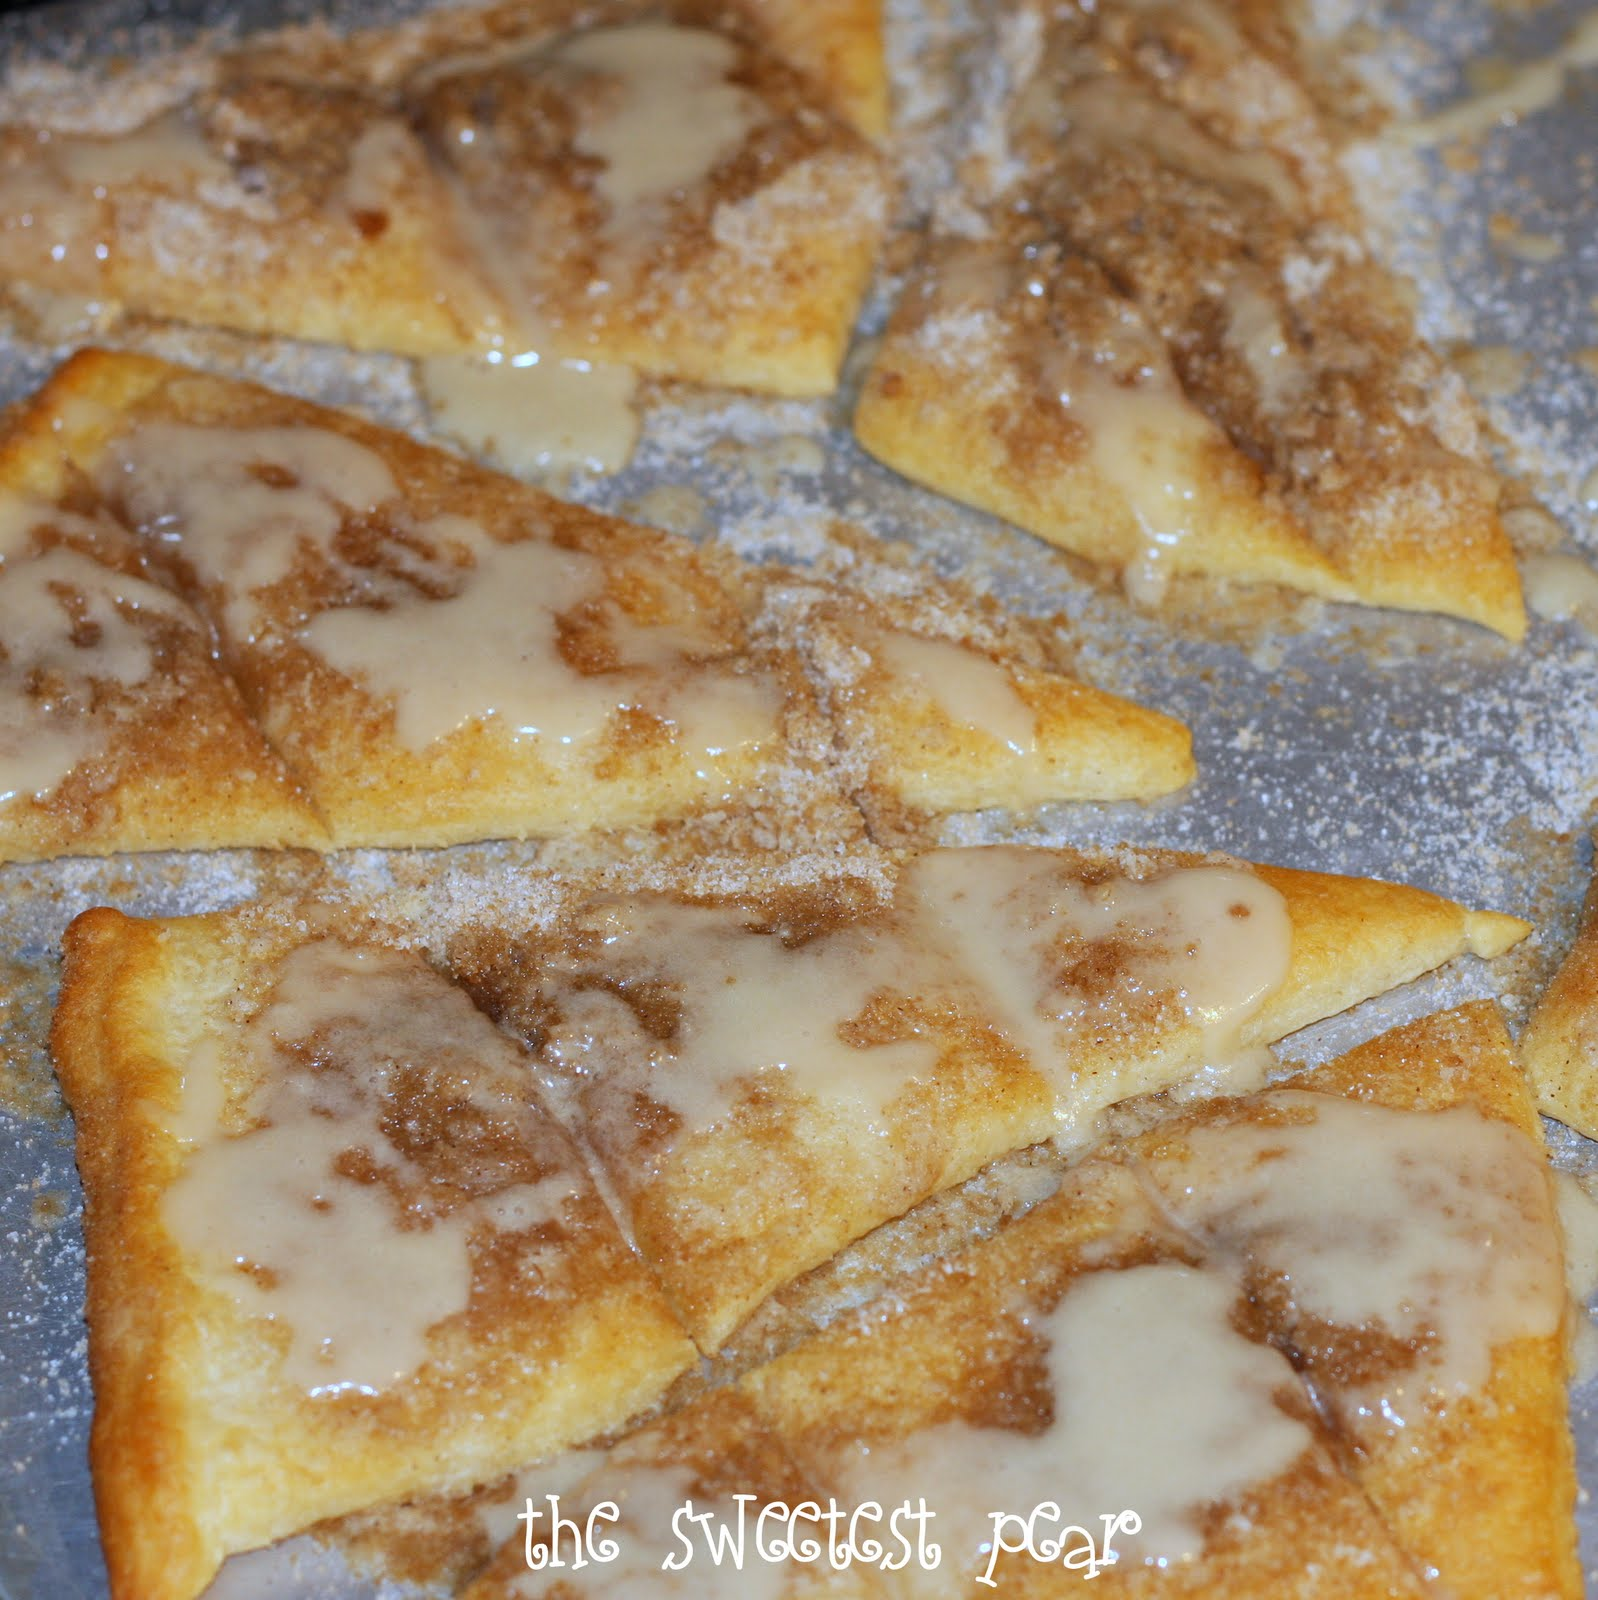 Cinnamon-Sugar Pizza made with crescent rolls.